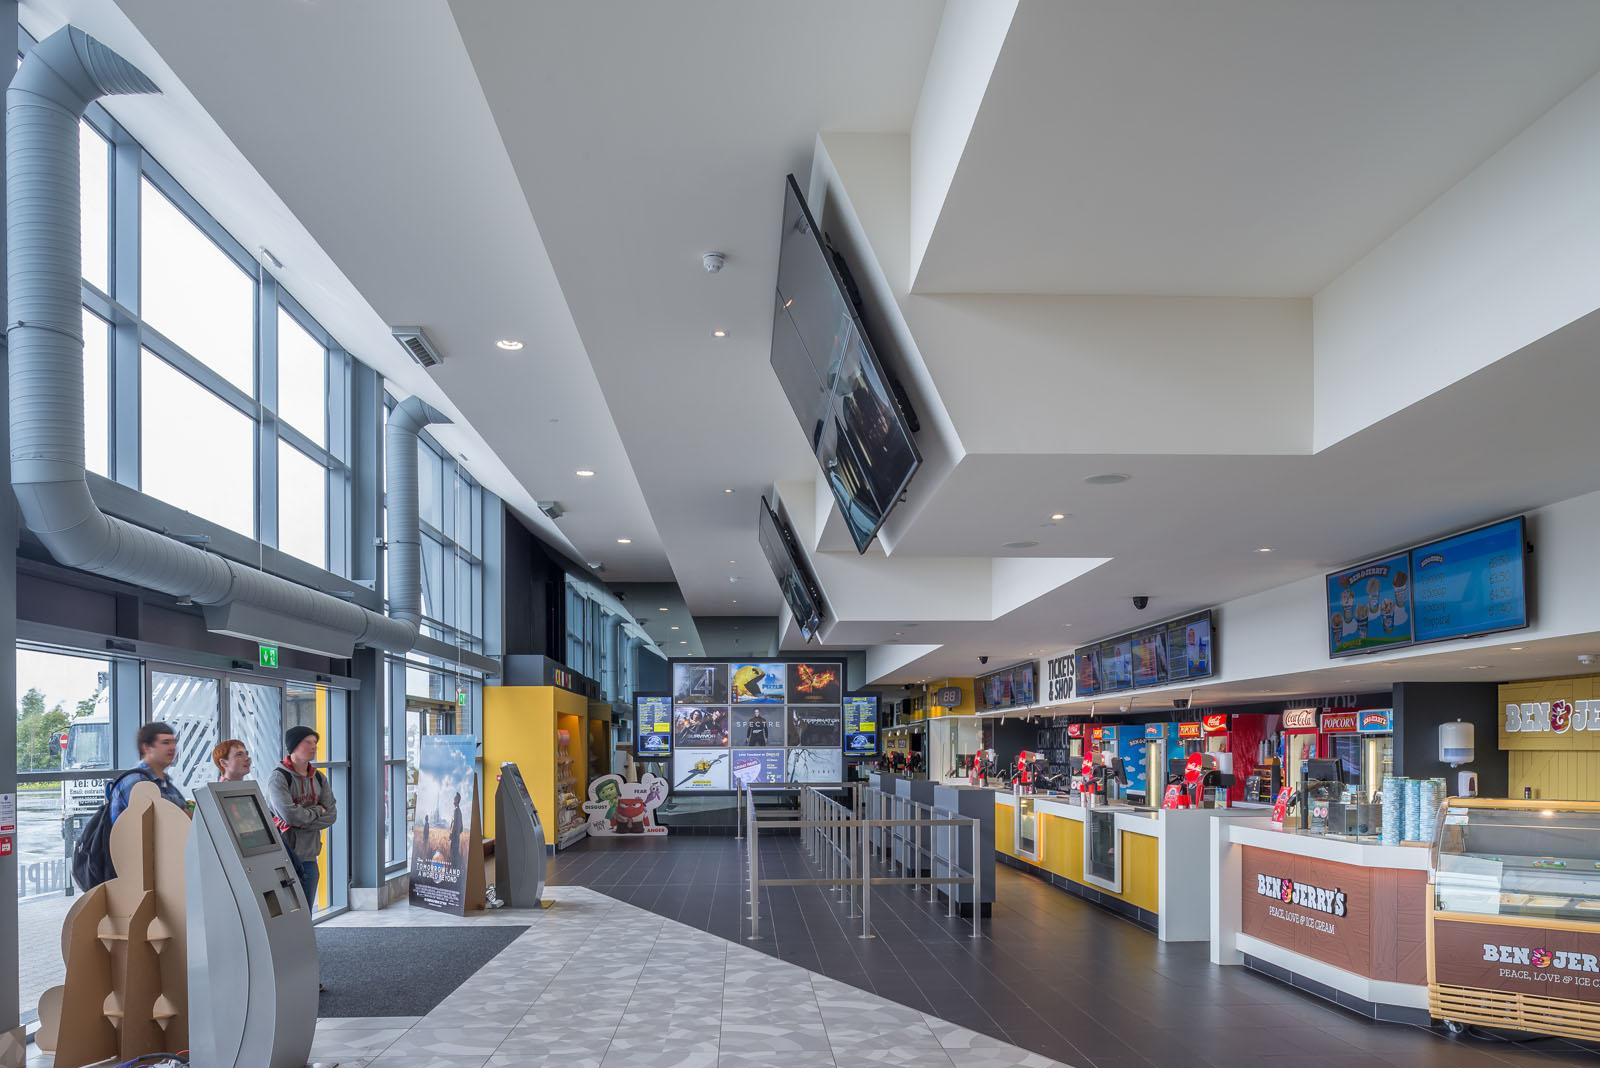 Omniplex Cinemas Ireland Airconmech